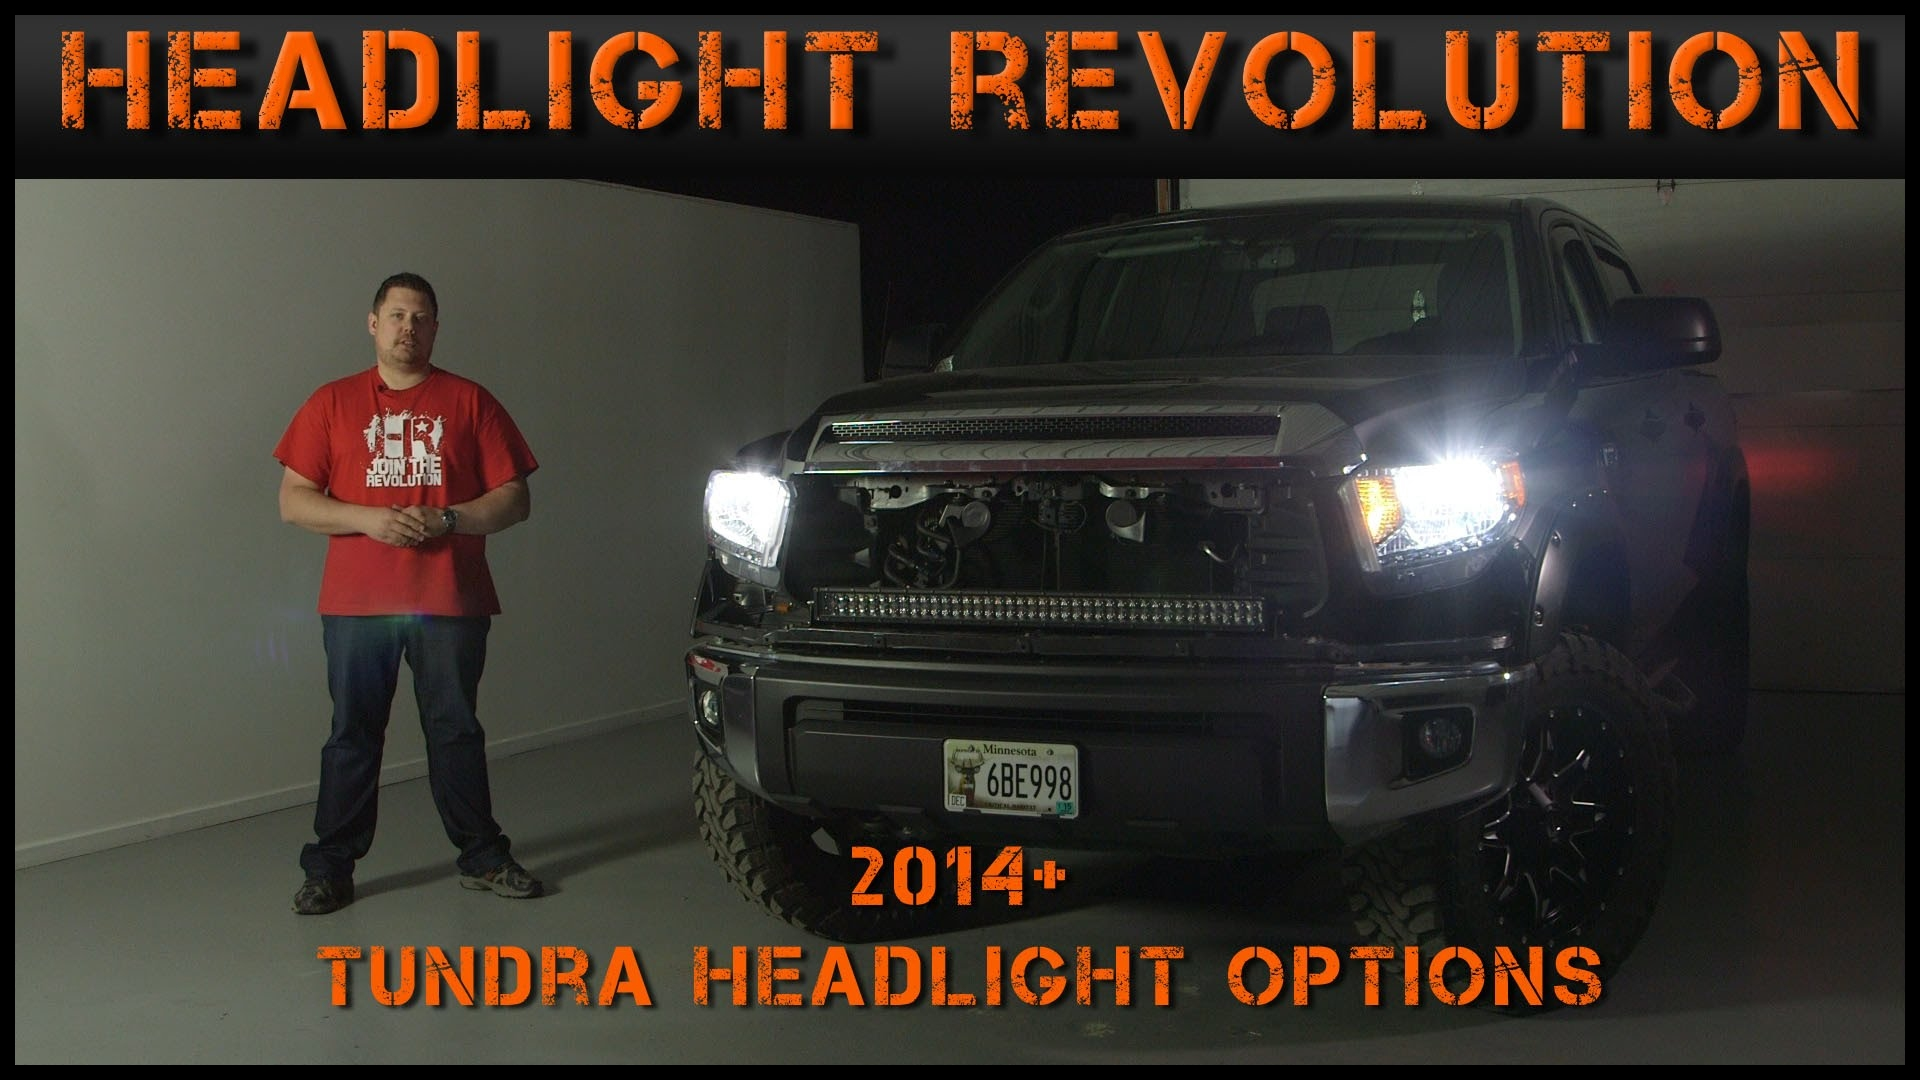 2014 2017 Toyota Tundra Headlight Options Tundra Video Series 6